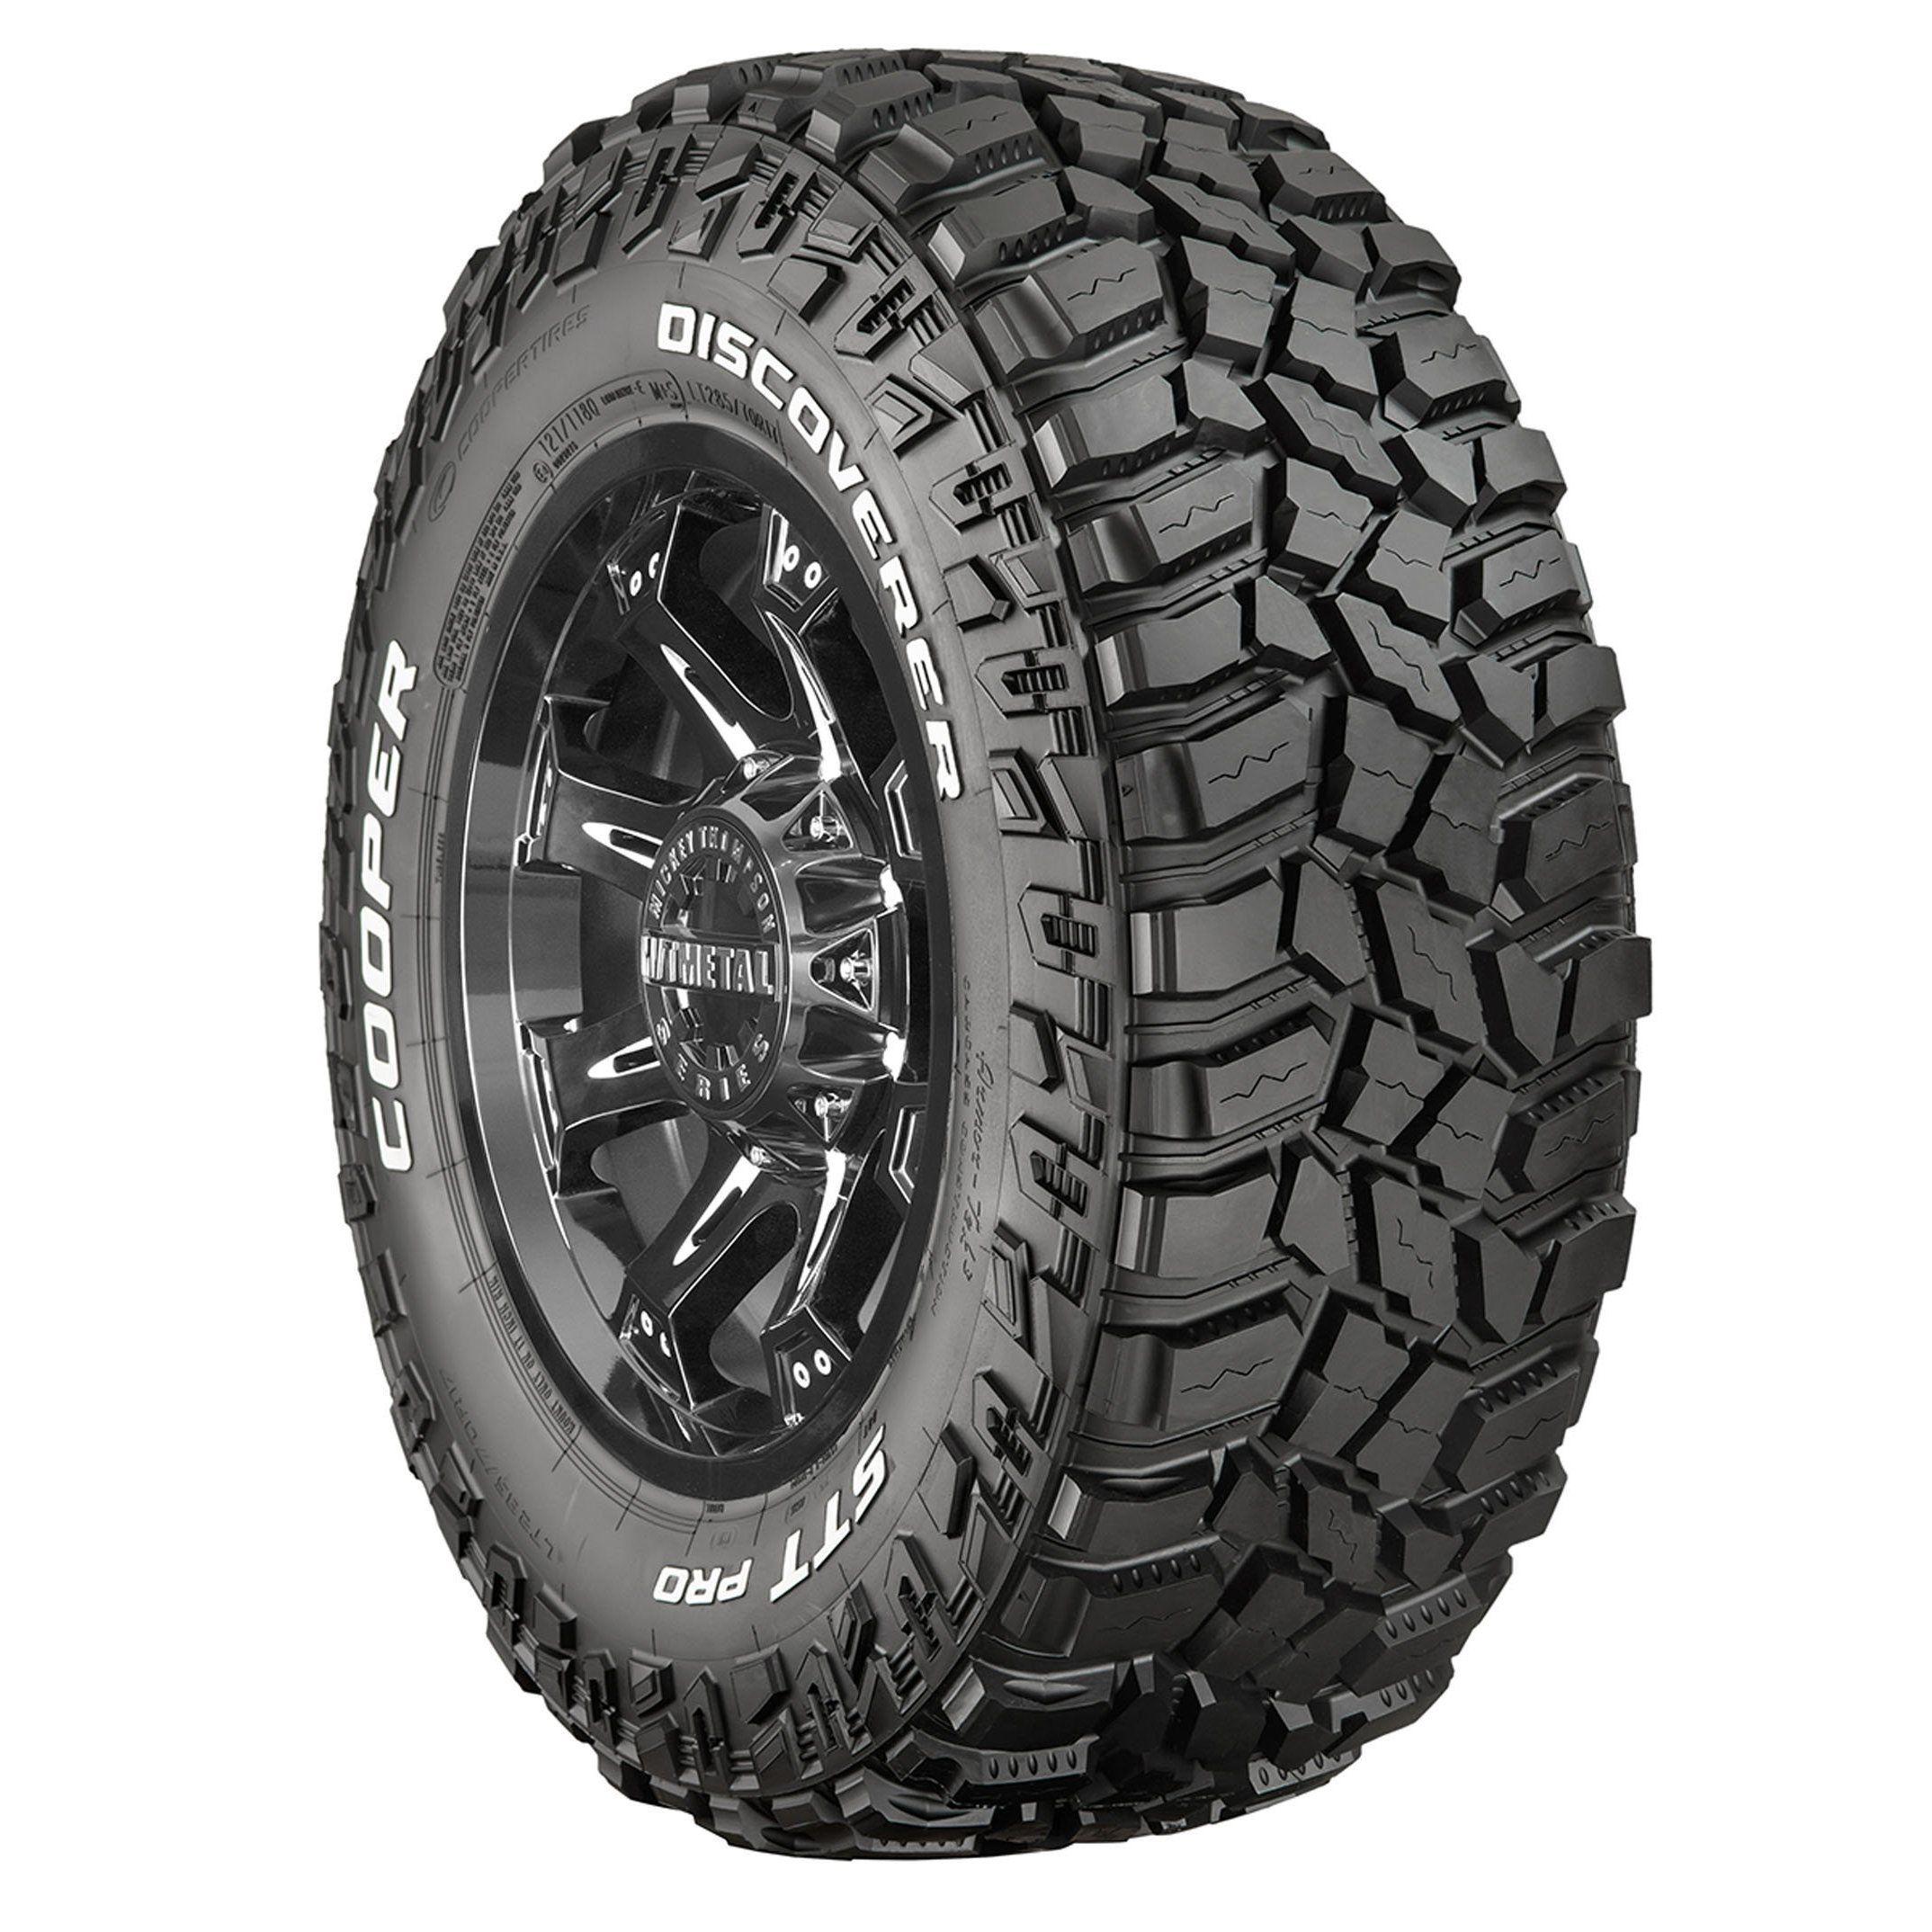 Cooper Discoverer STT Pro f Road Tire LT295 70R17 LRE 10 ply